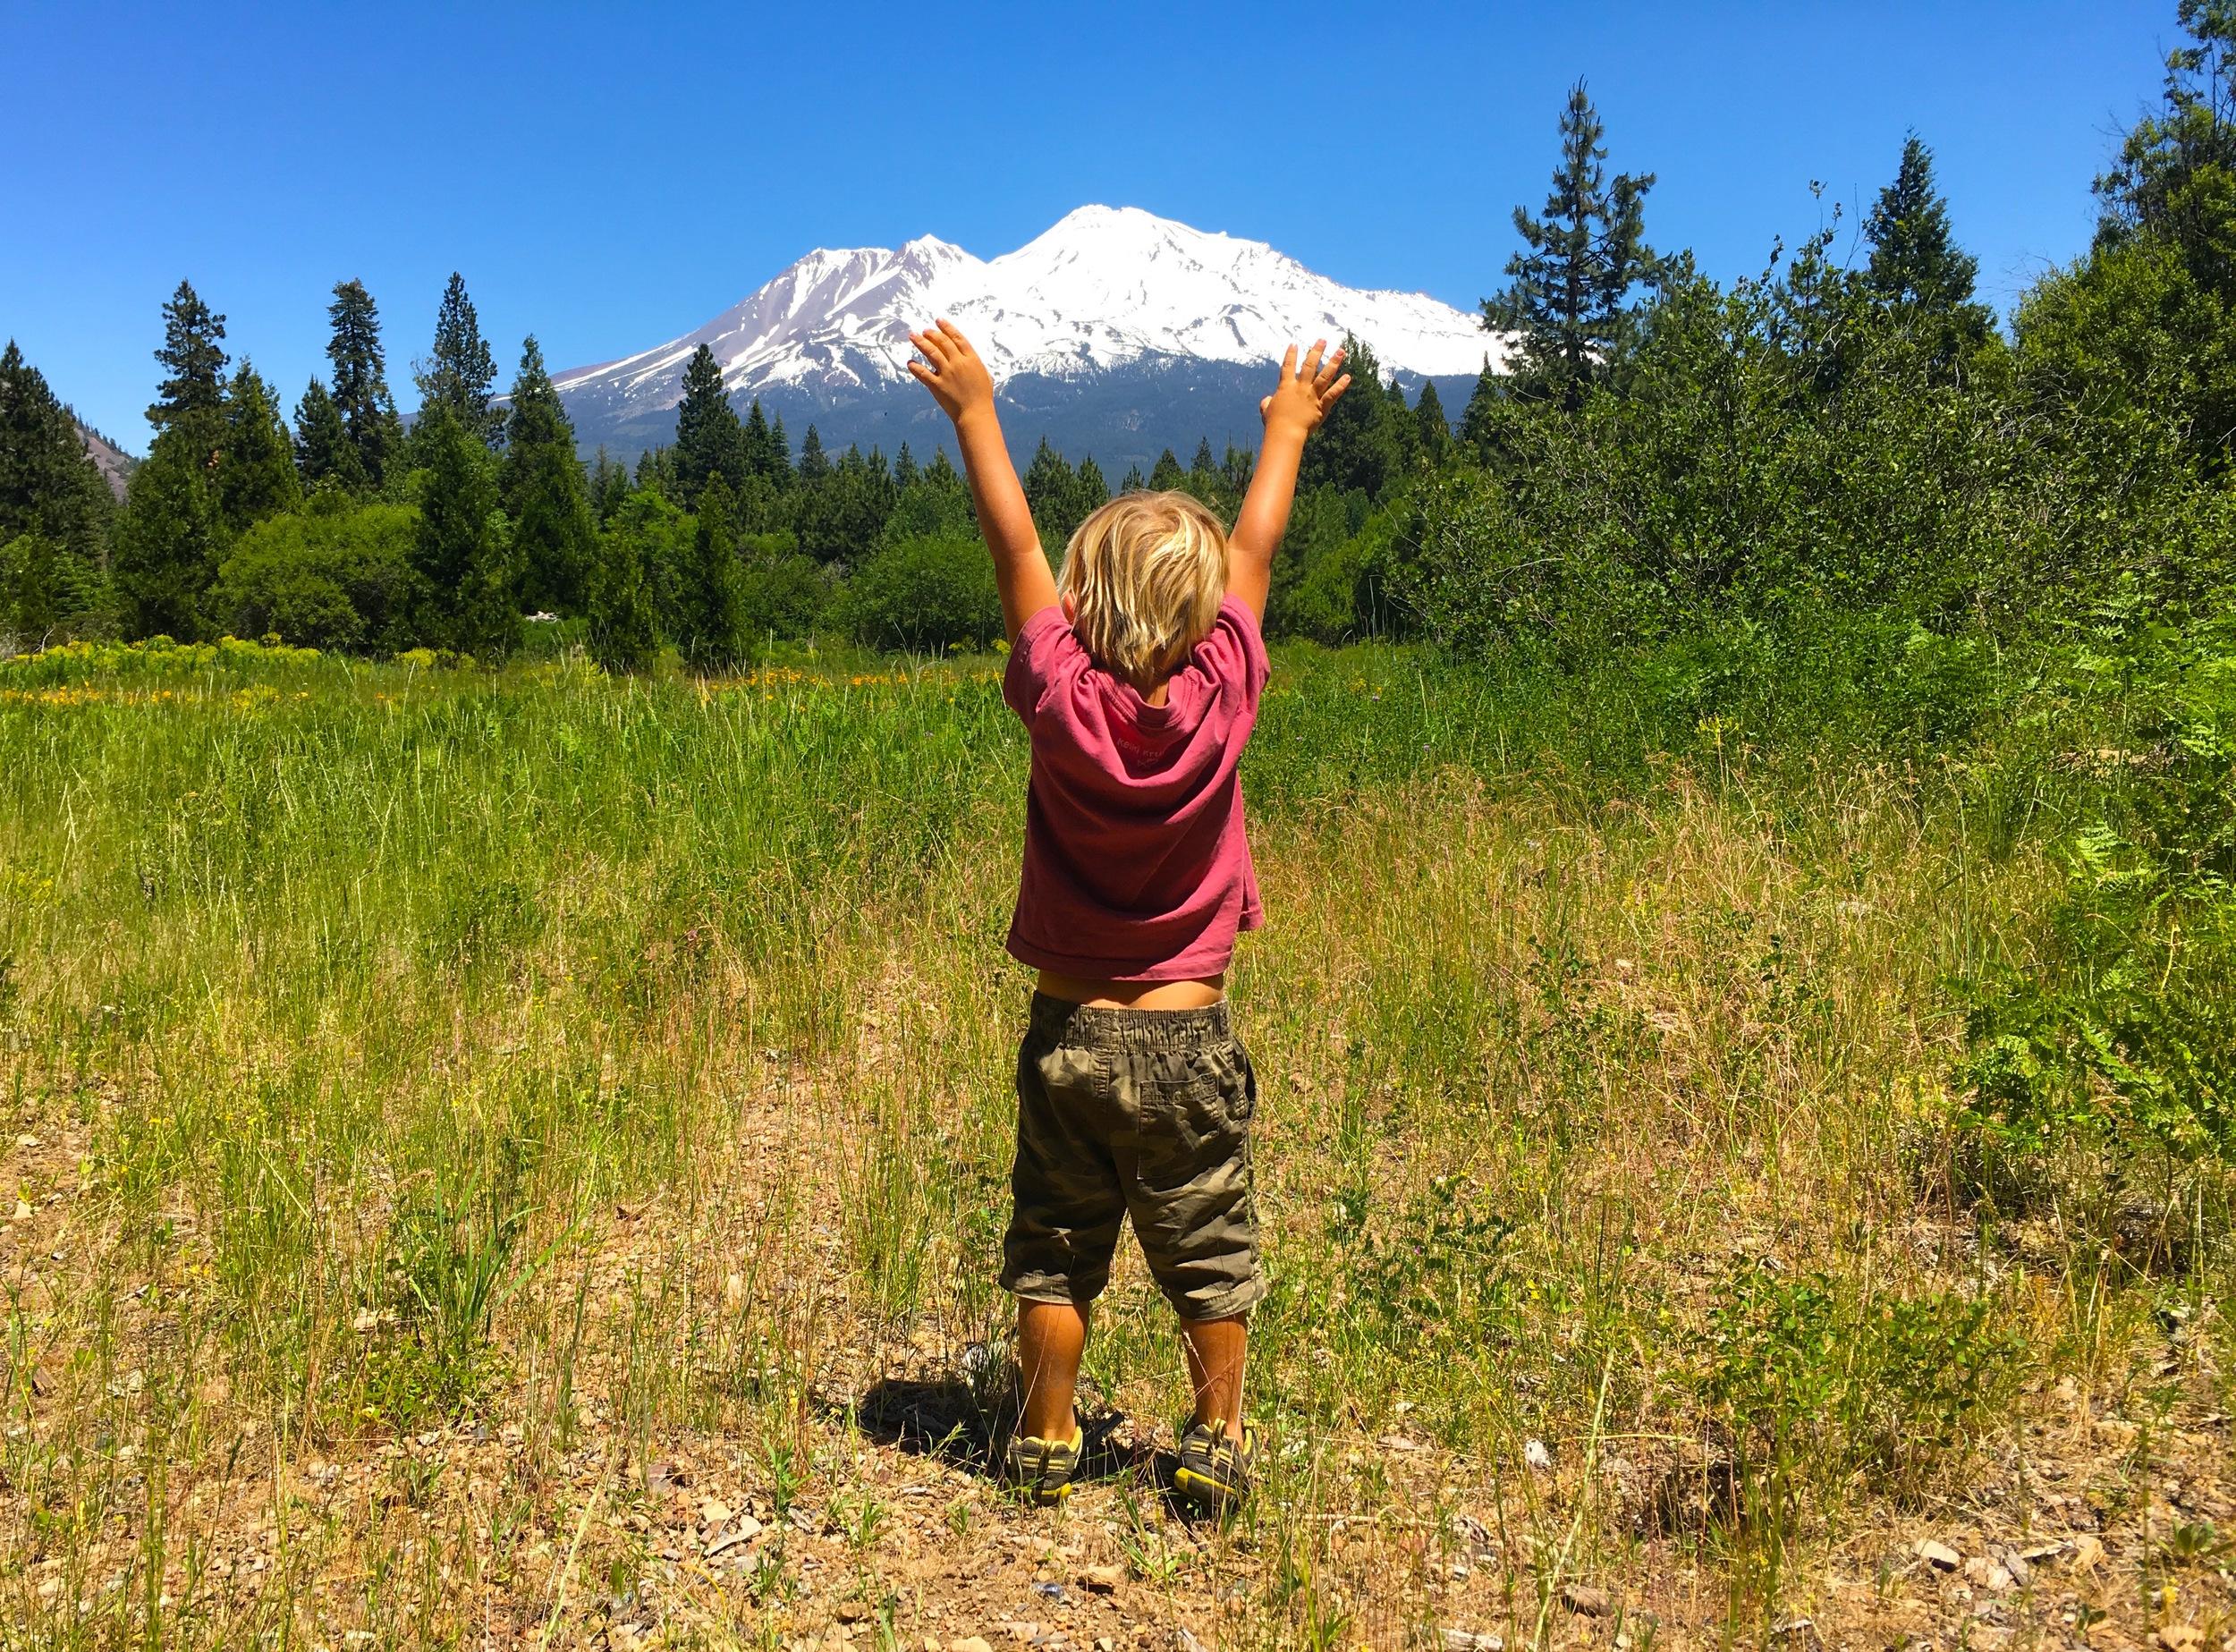 Raphael with Mount Shasta